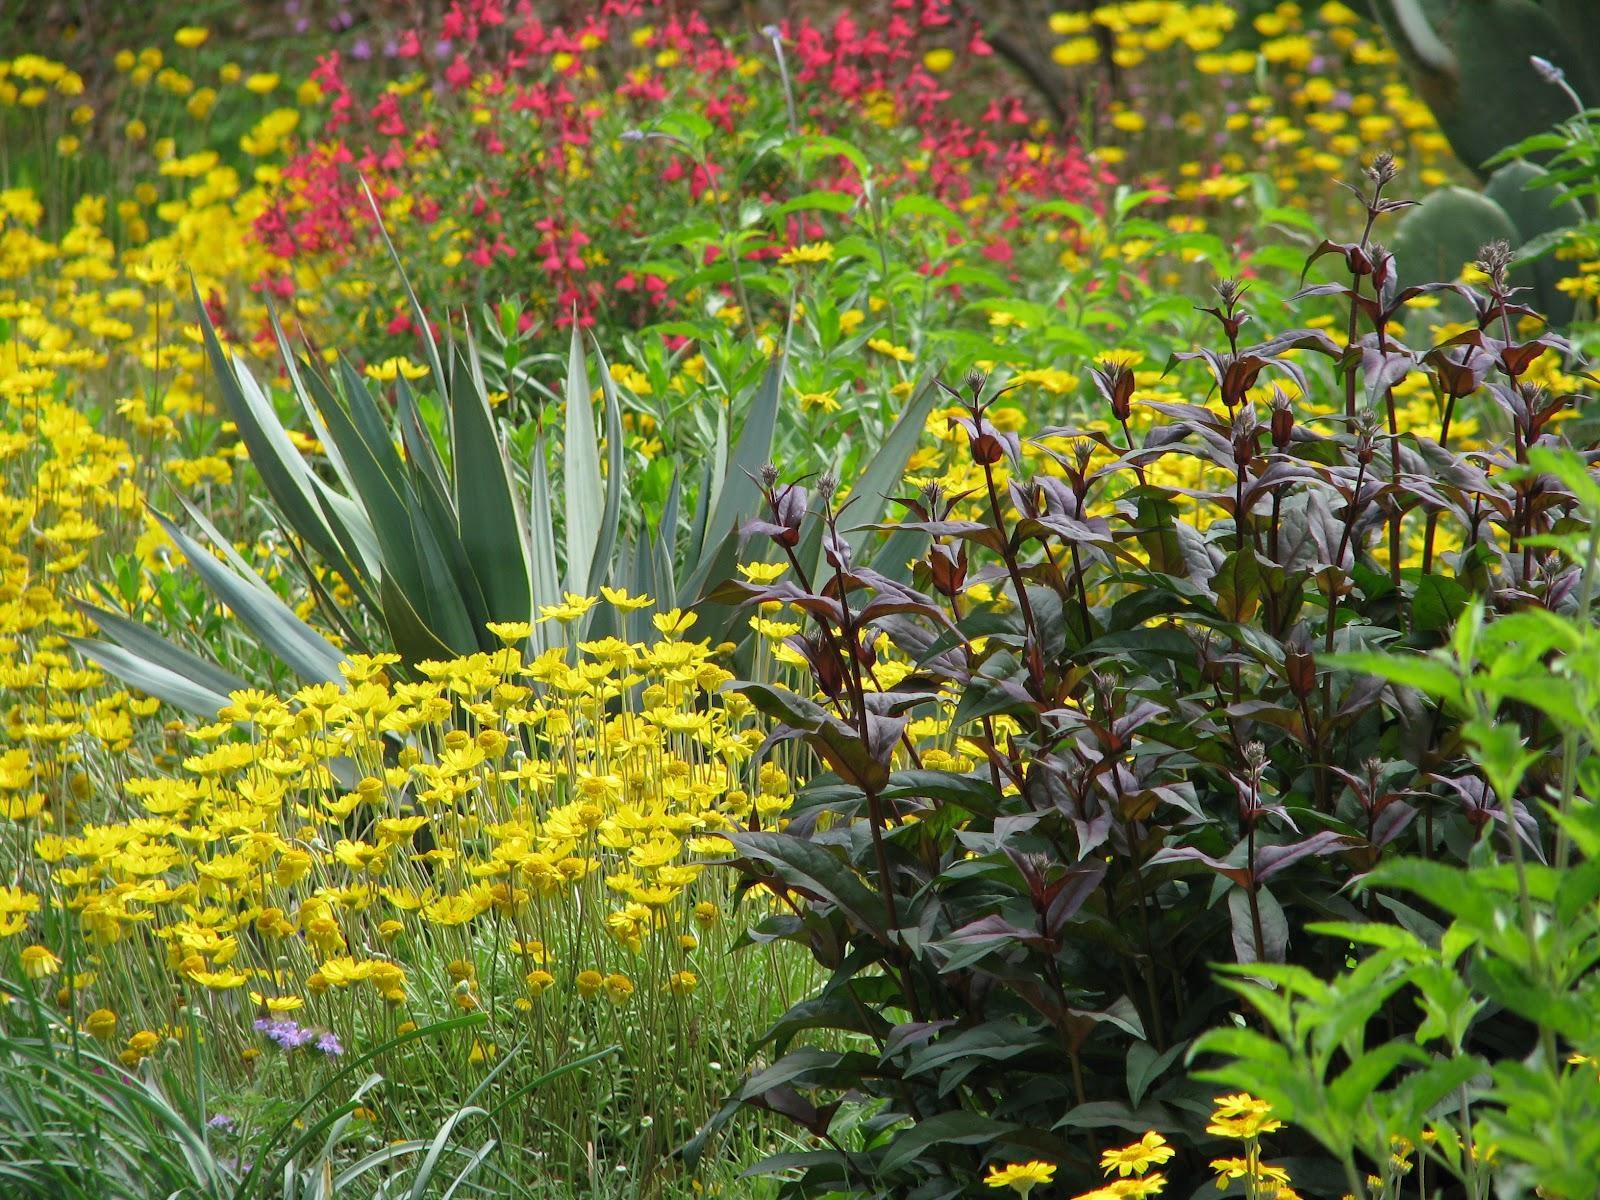 Lawn Maintenance Plano >> Plano Prairie Garden: The End of My Foolish Prairie Garden